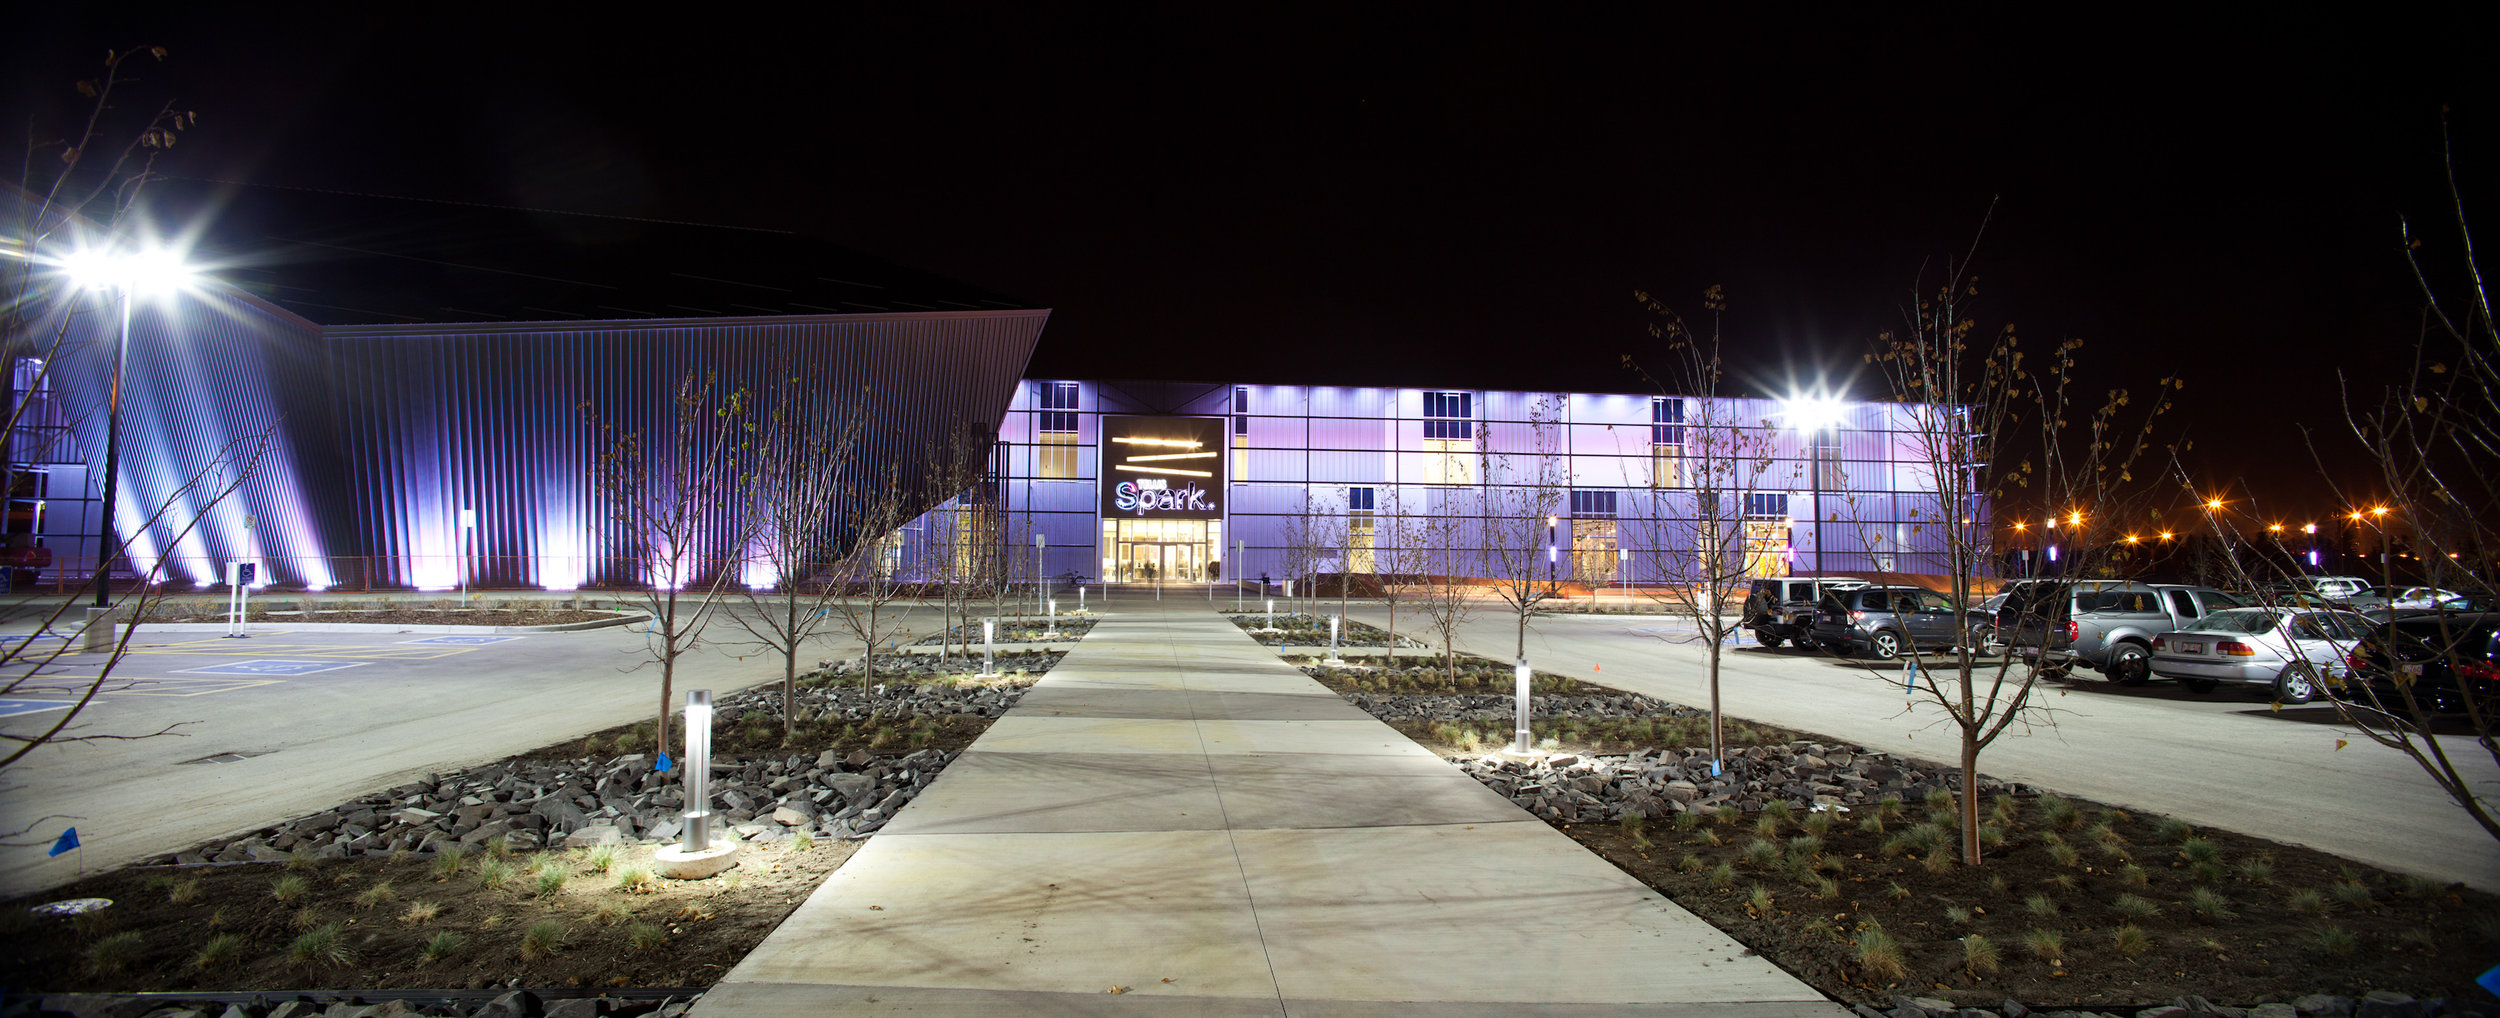 Telus Spark - The New Science Centre & Creative Kids Museum (1).jpg